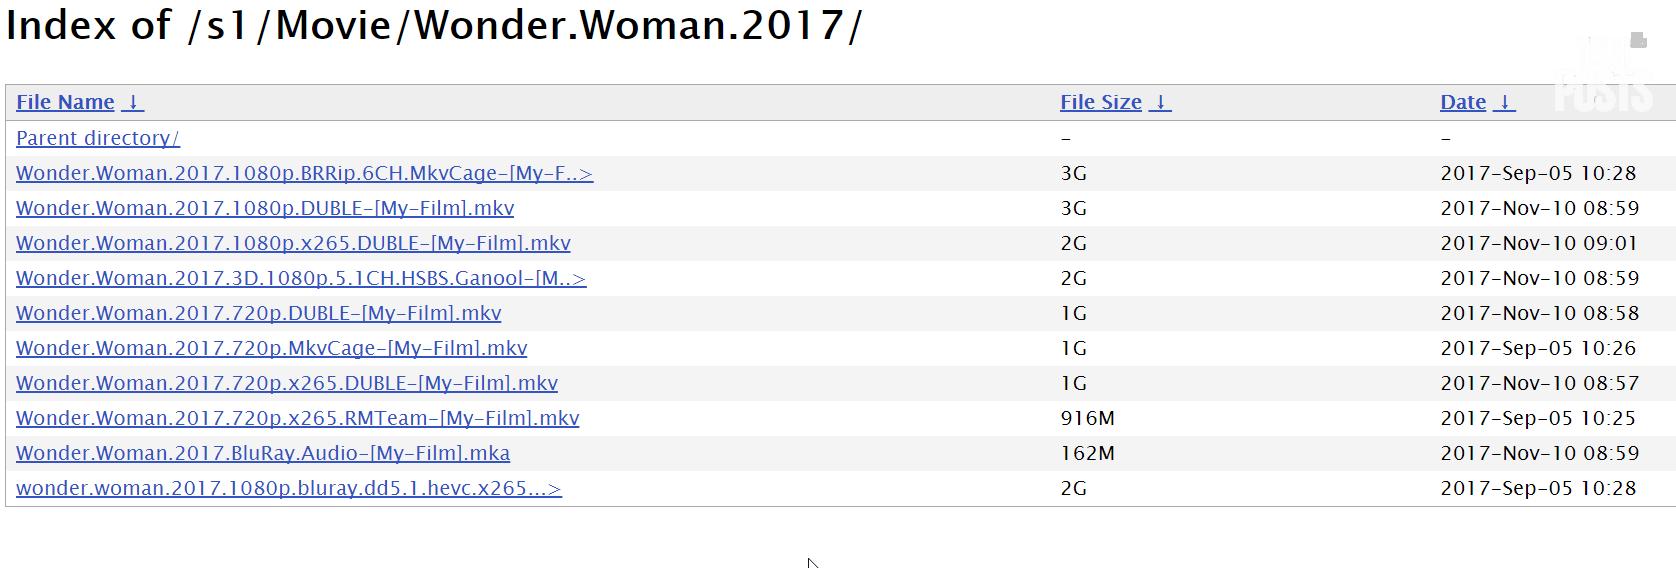 Index of _s1_Movie_Wonder.Woman.2017_